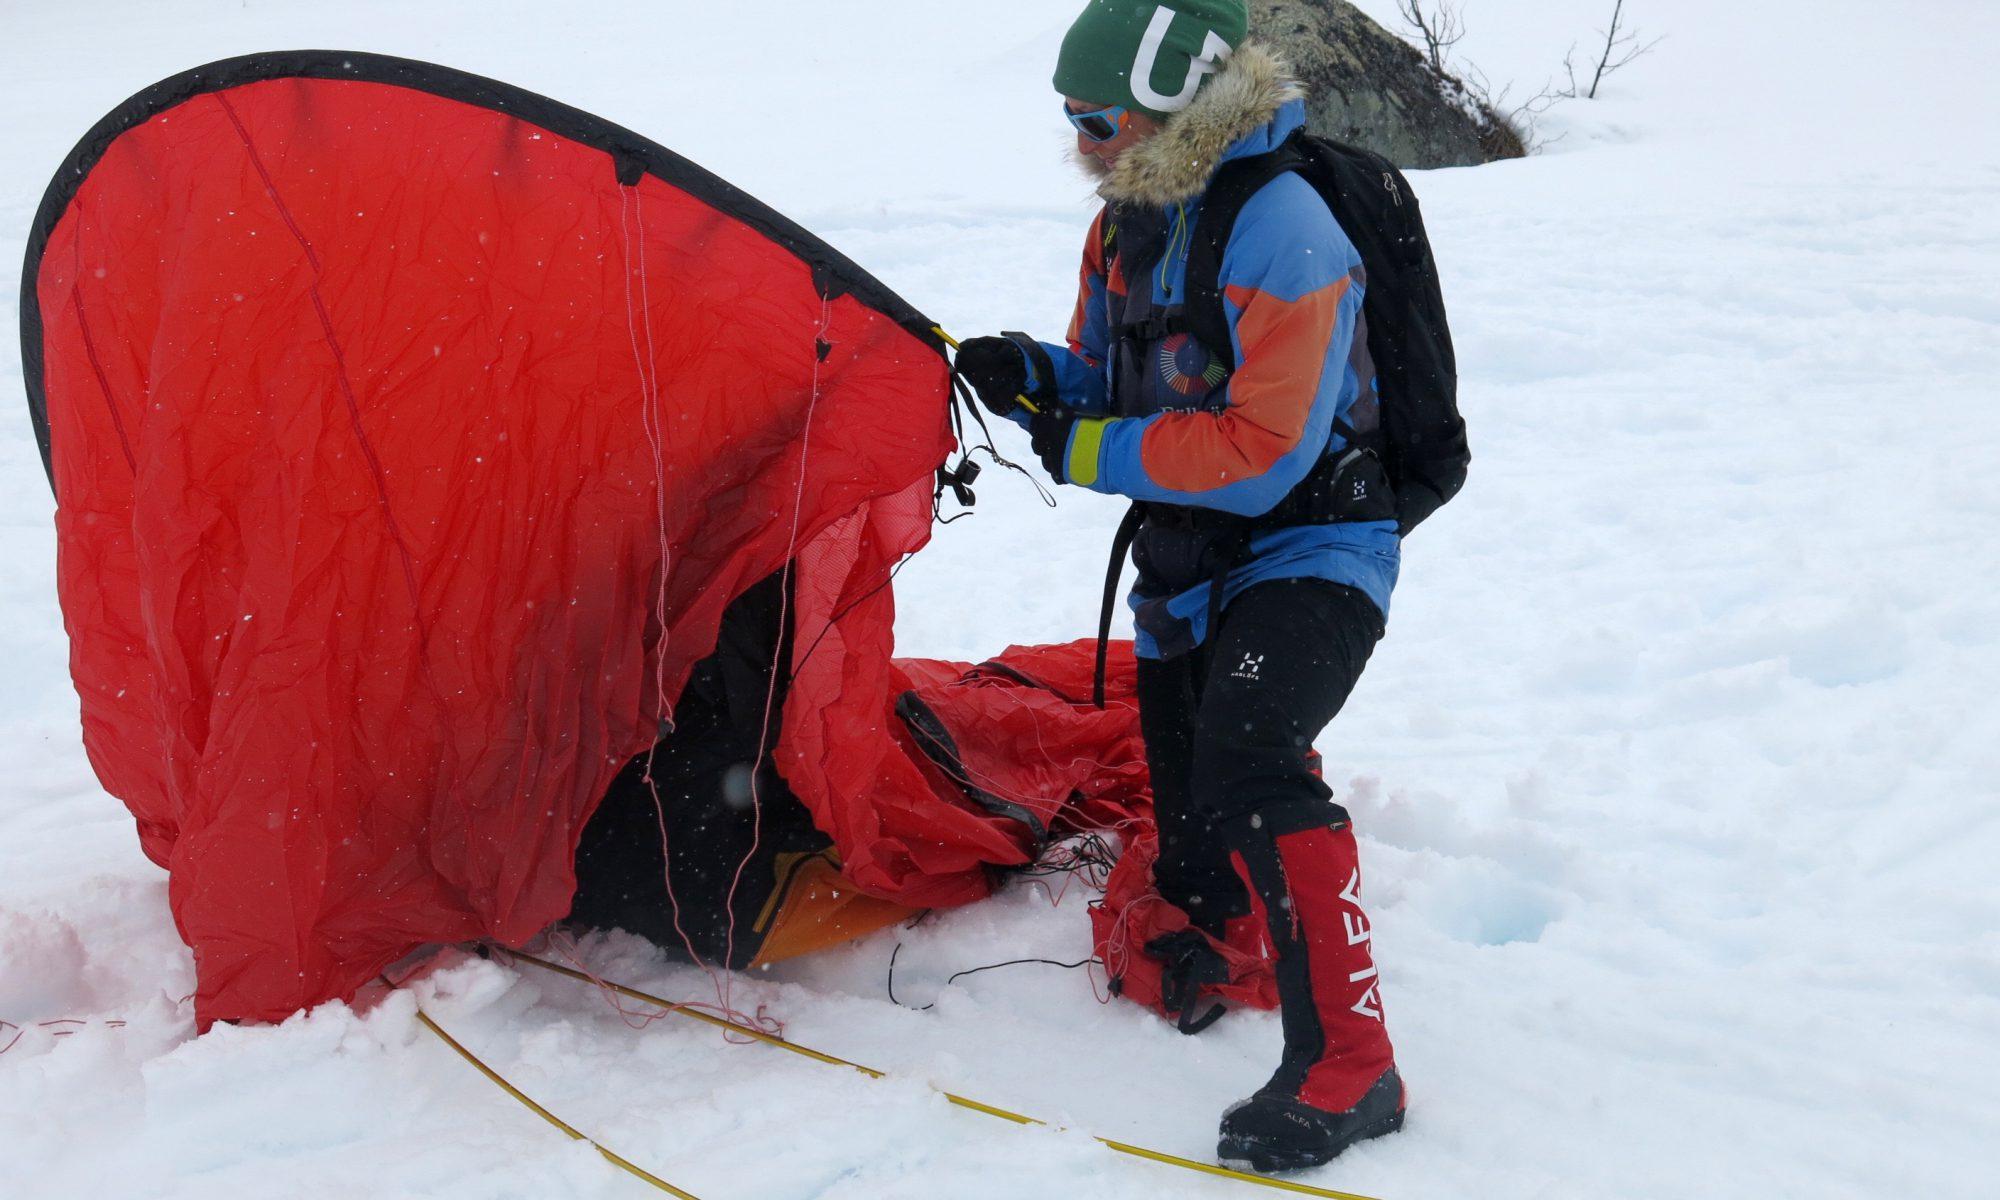 johanna sätter upp tält